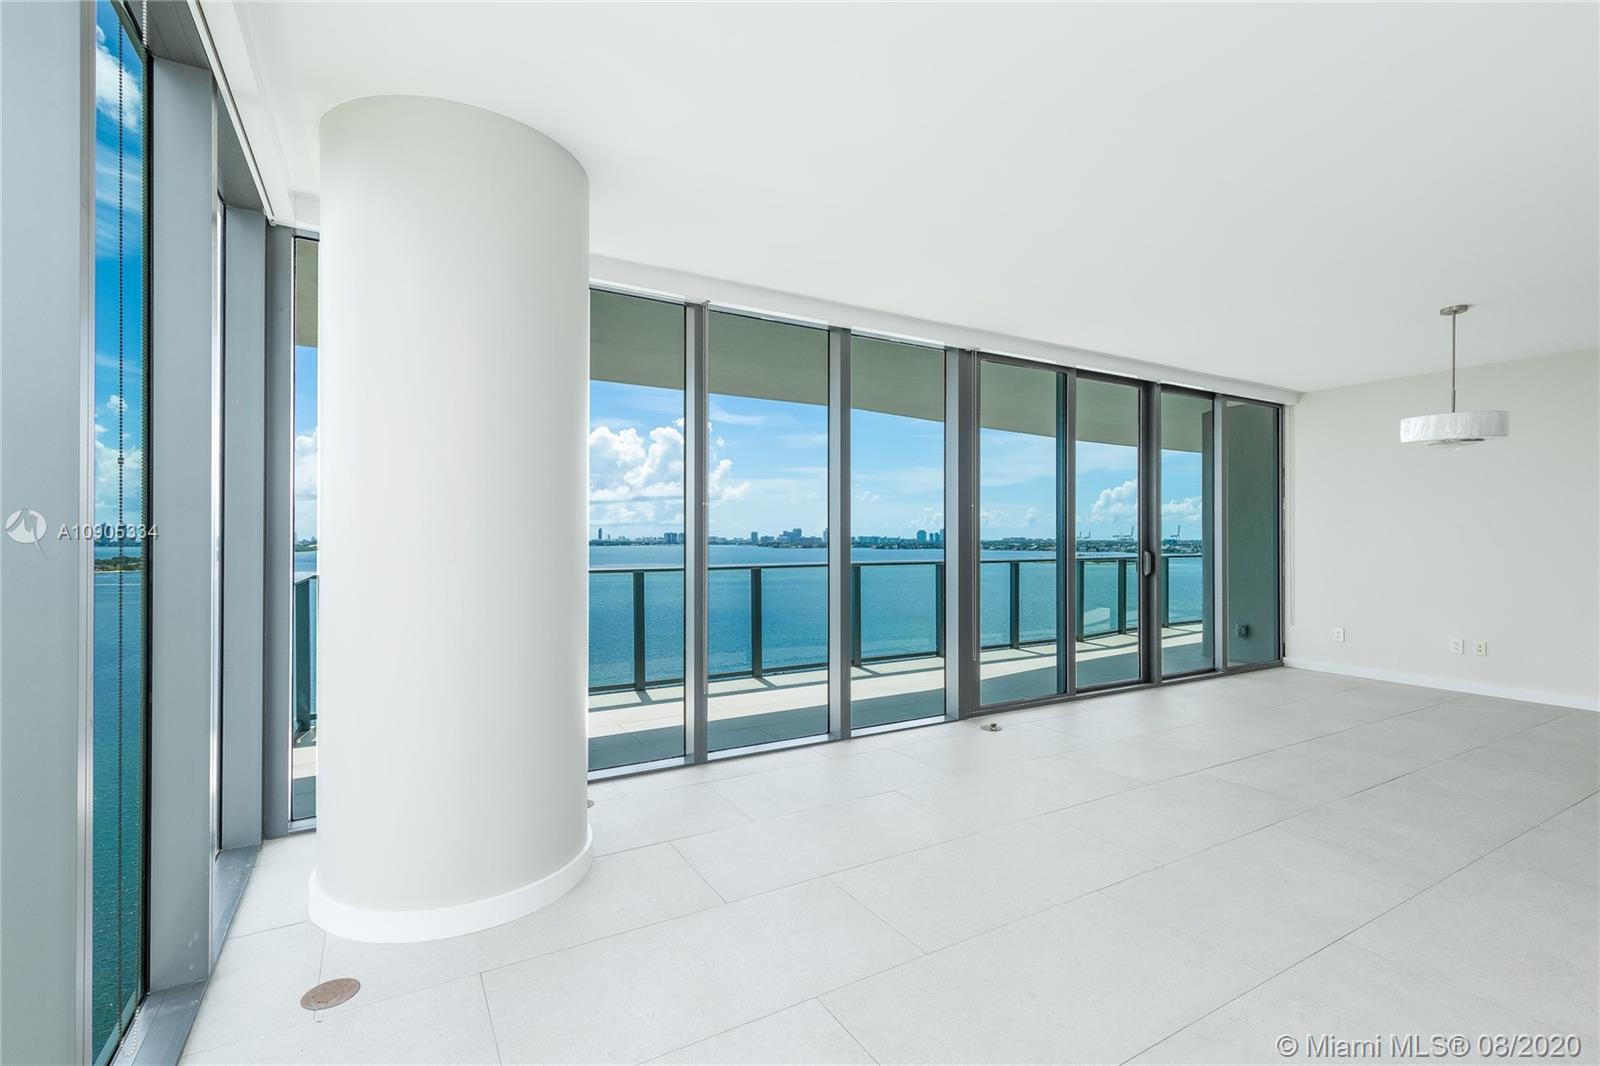 Real Estate Photo A10905334